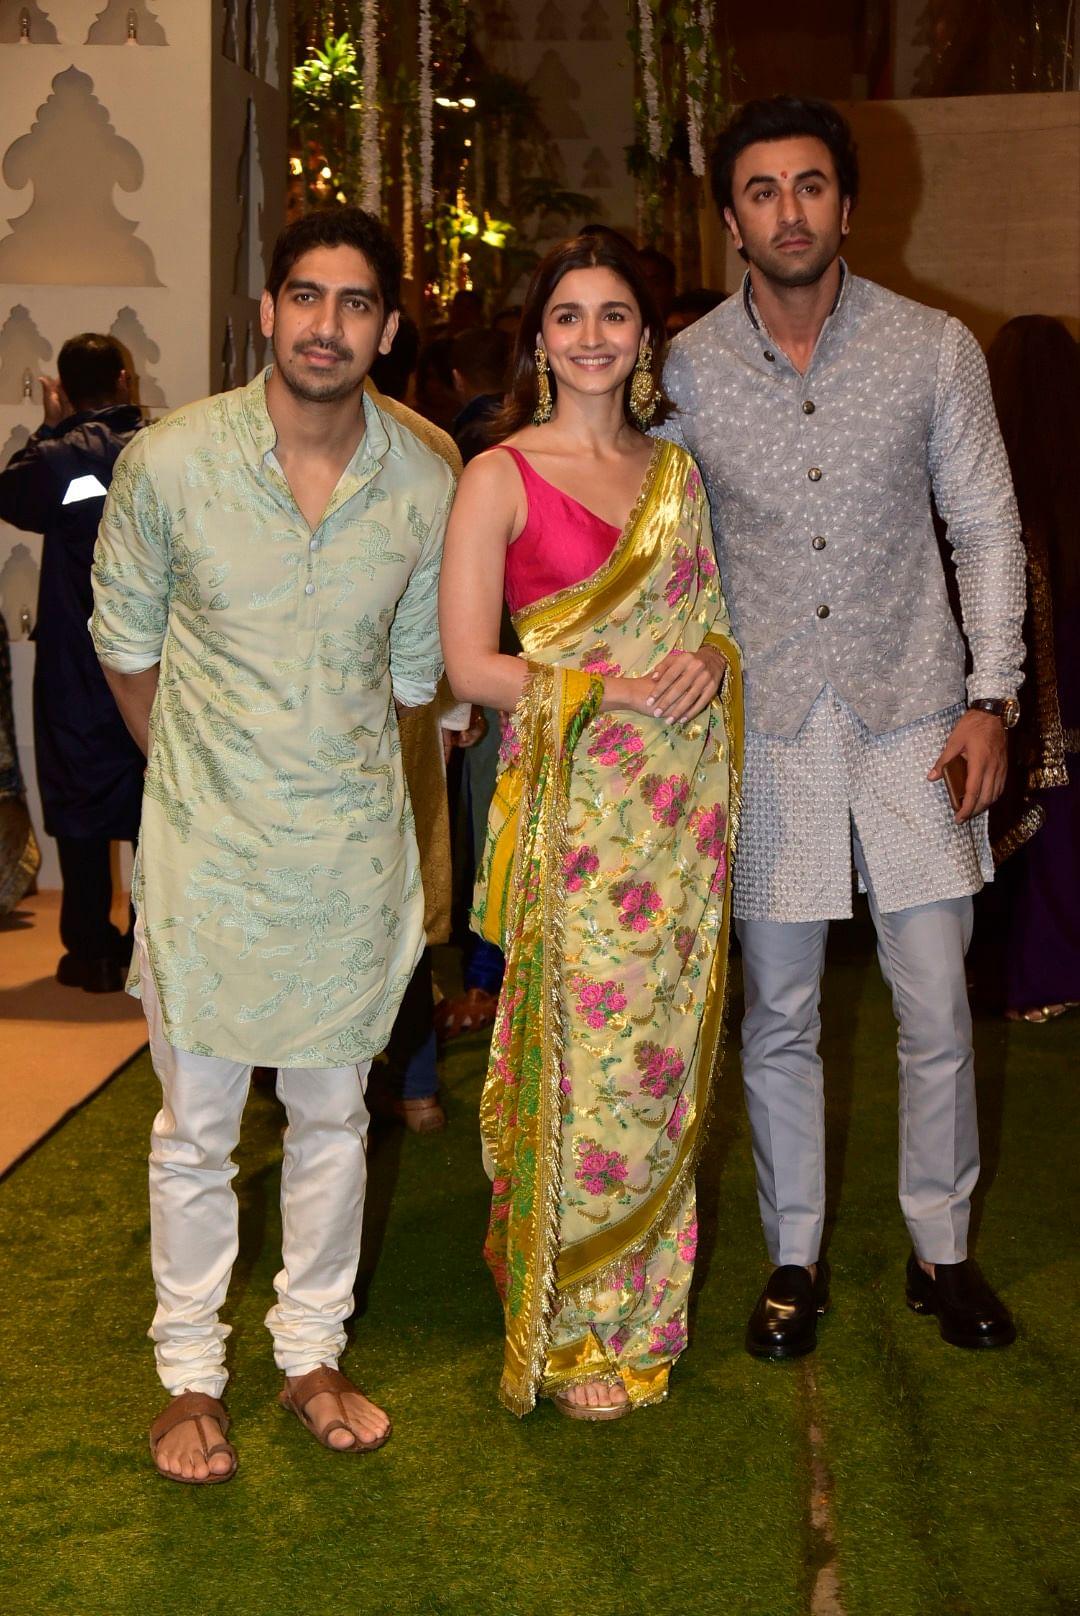 Ayan Muerki with Alia and Ranbir at Ambani's Ganpati festival celebrations